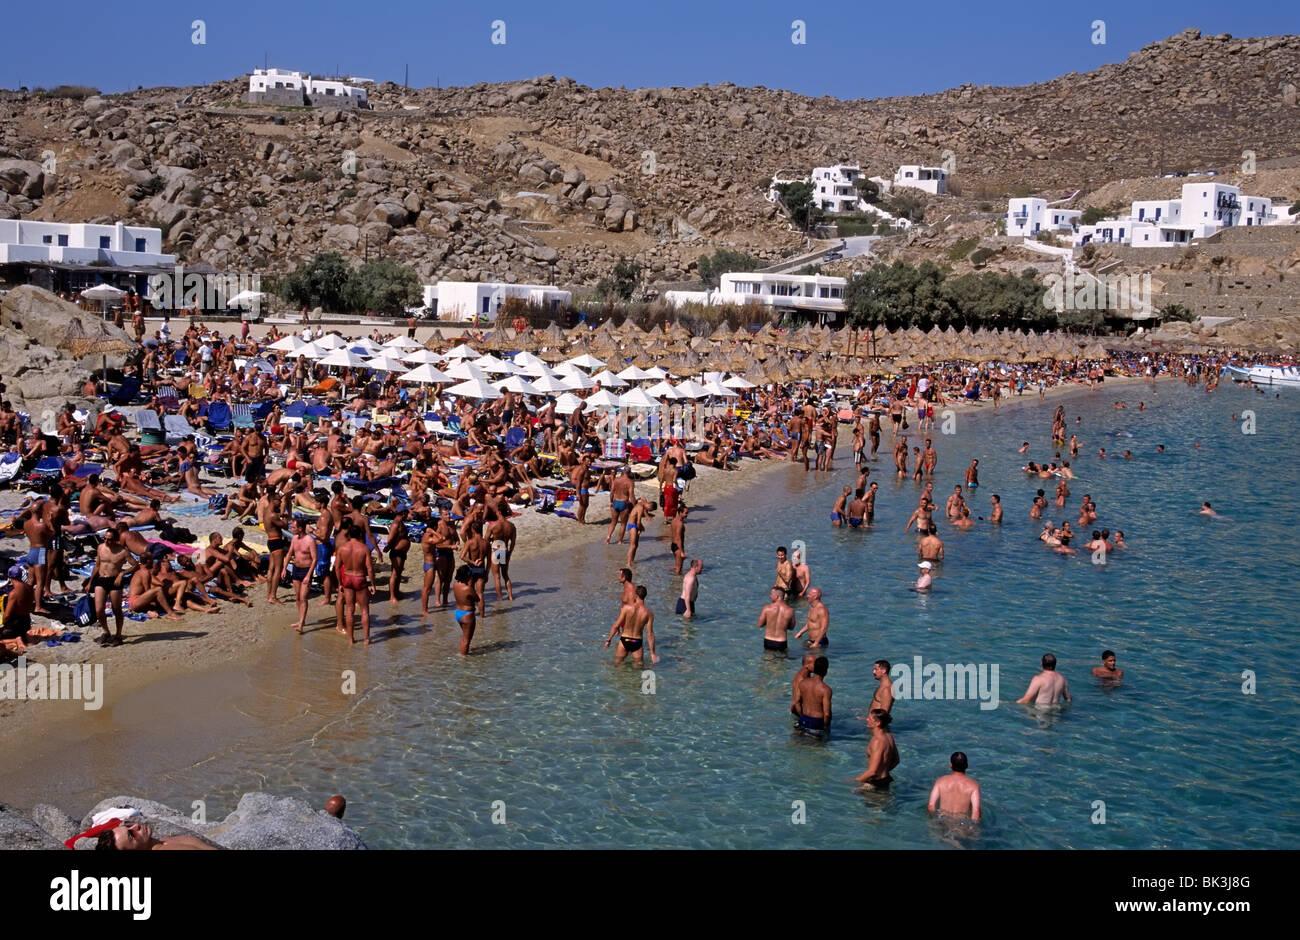 Paradise beach images